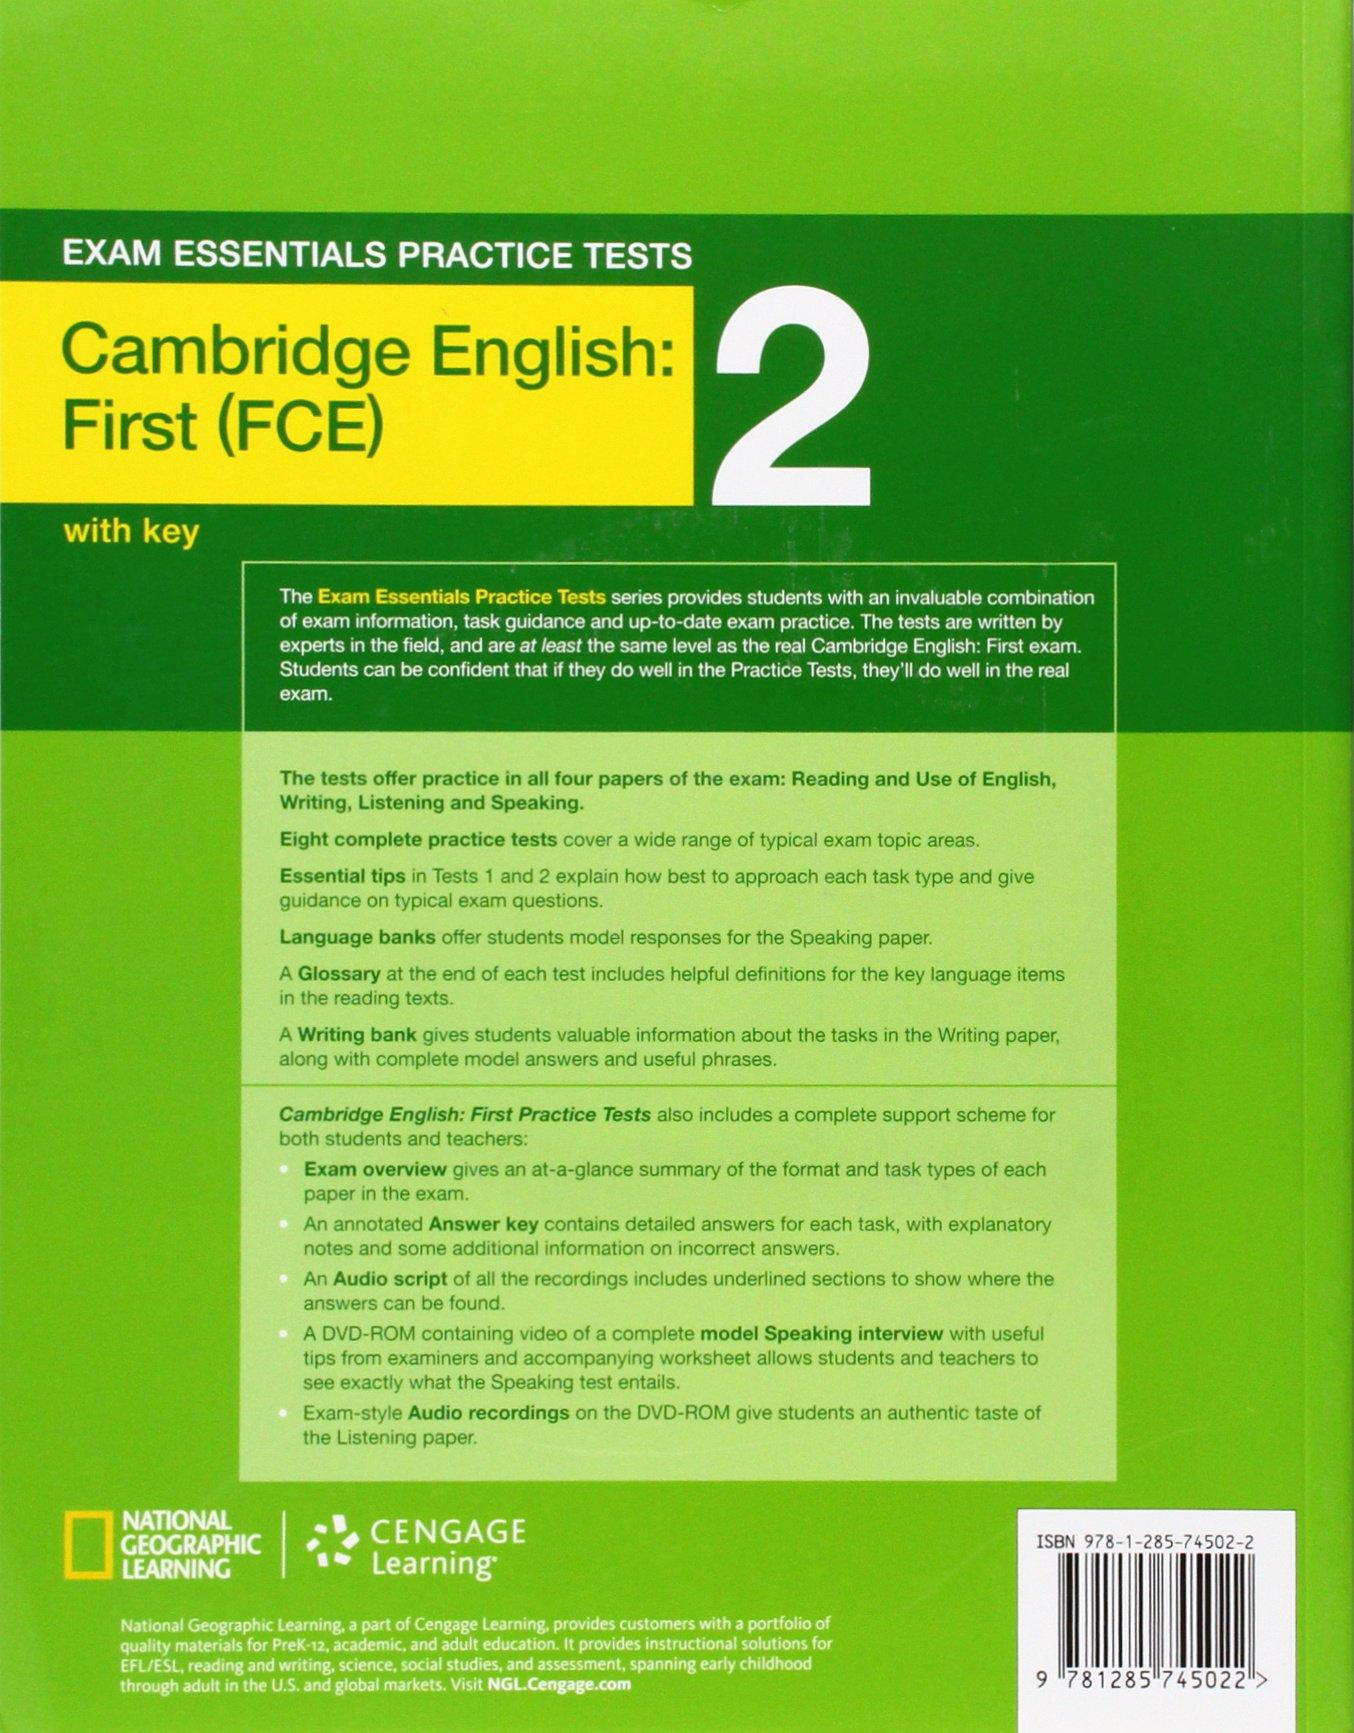 Exam essentials cambridge first practice tests 2 w key dvd rom amazon co uk helen chilton helen tiliouine books